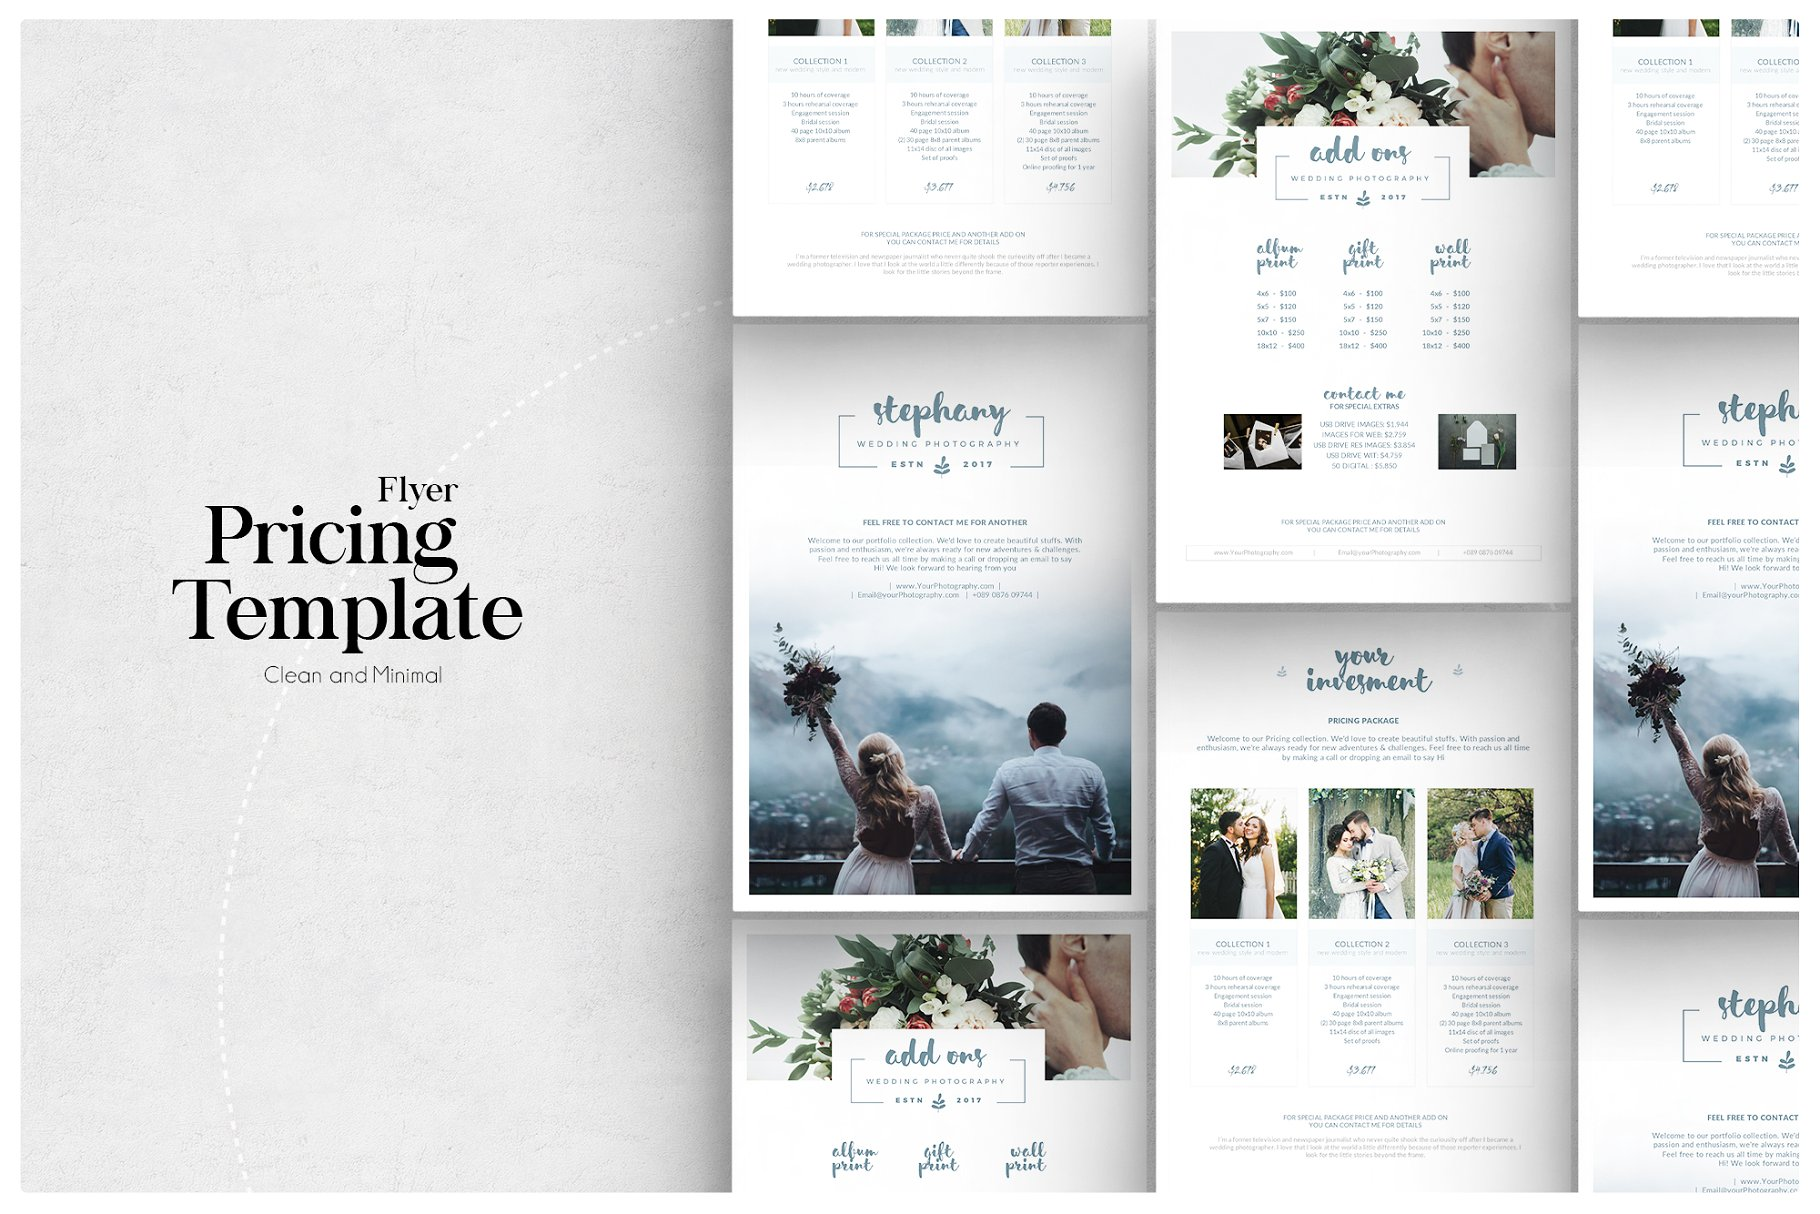 wedding-pricing-guide-1-3.jpg